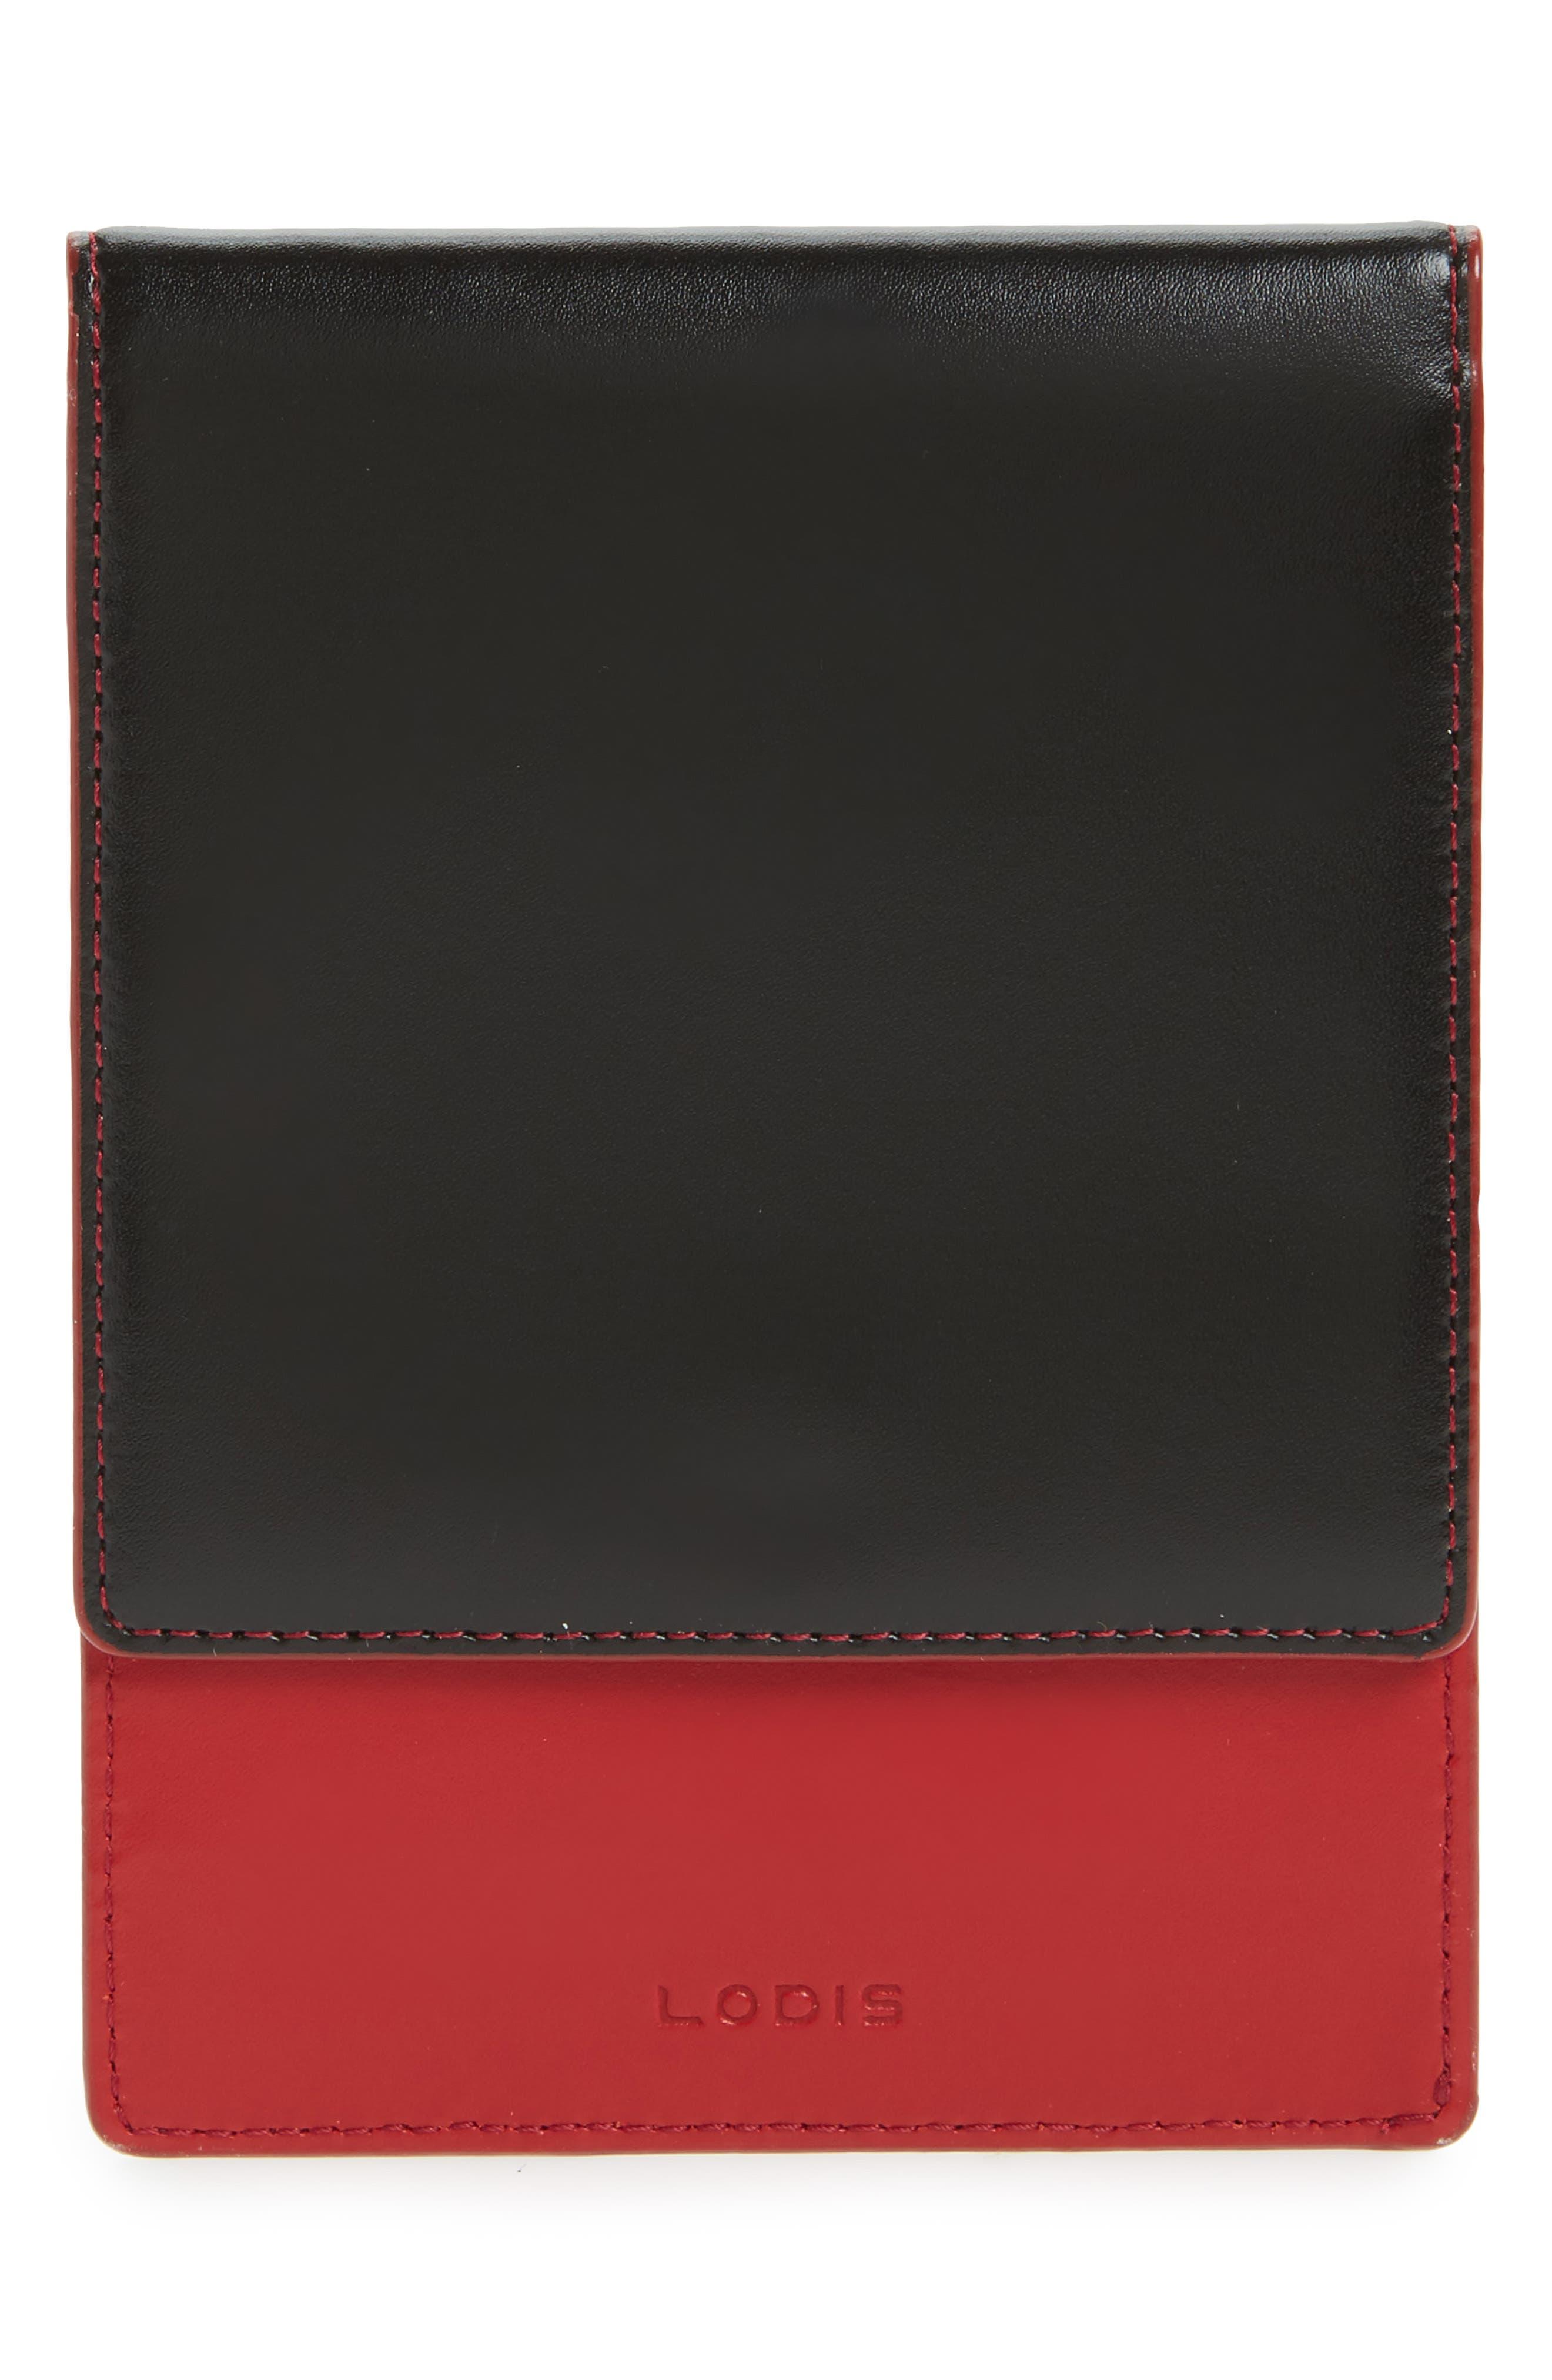 LODIS Audrey Under Lock & Key Skyler Leather Passport Wallet,                         Main,                         color, Black